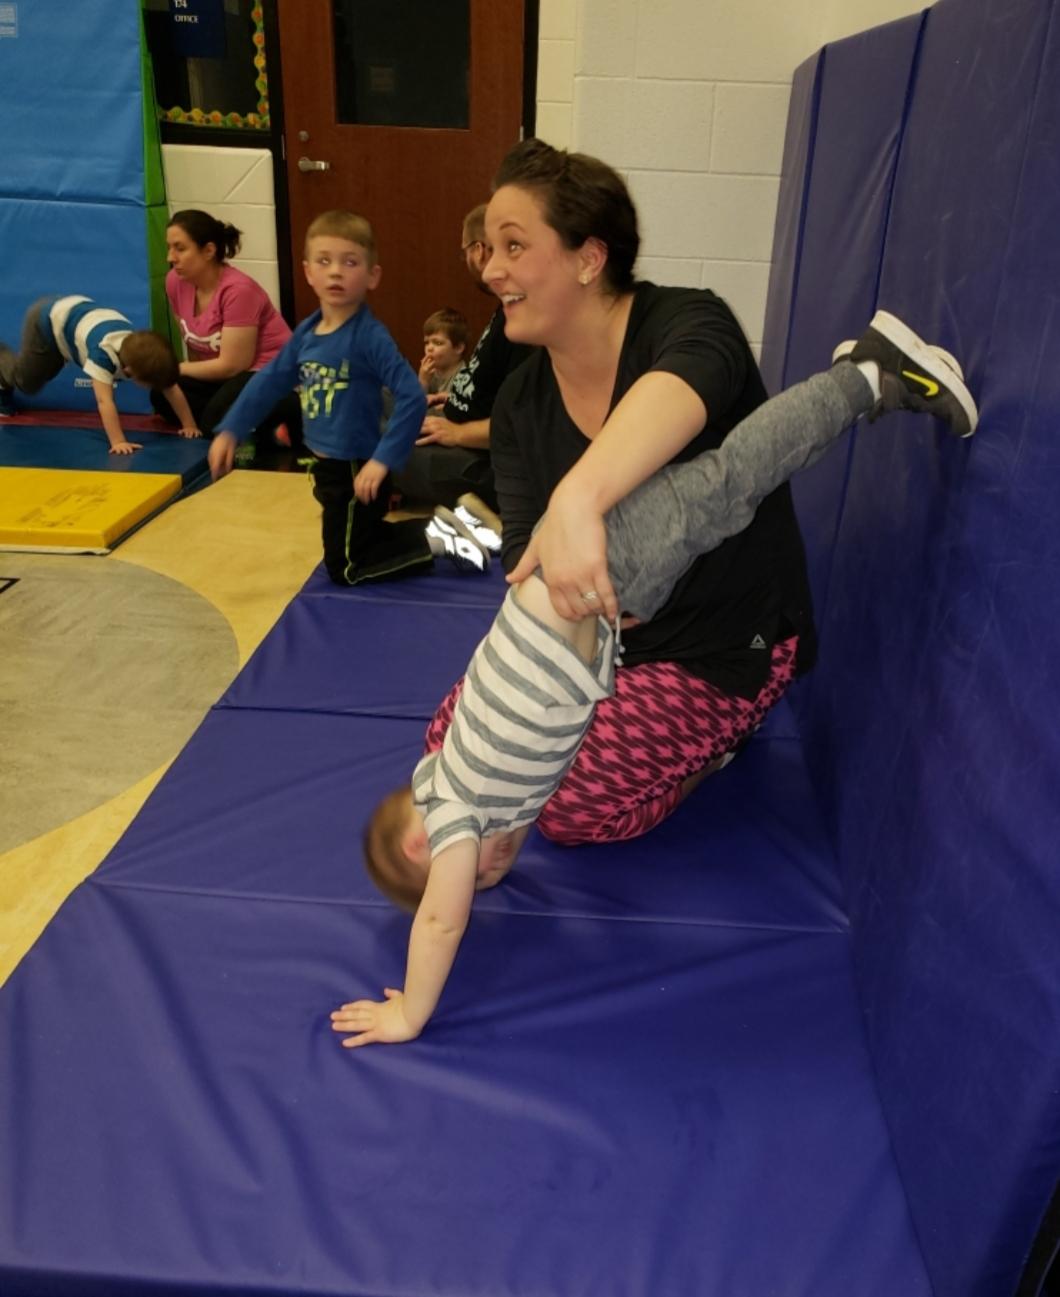 We Champion children - Coach Katya Winchell